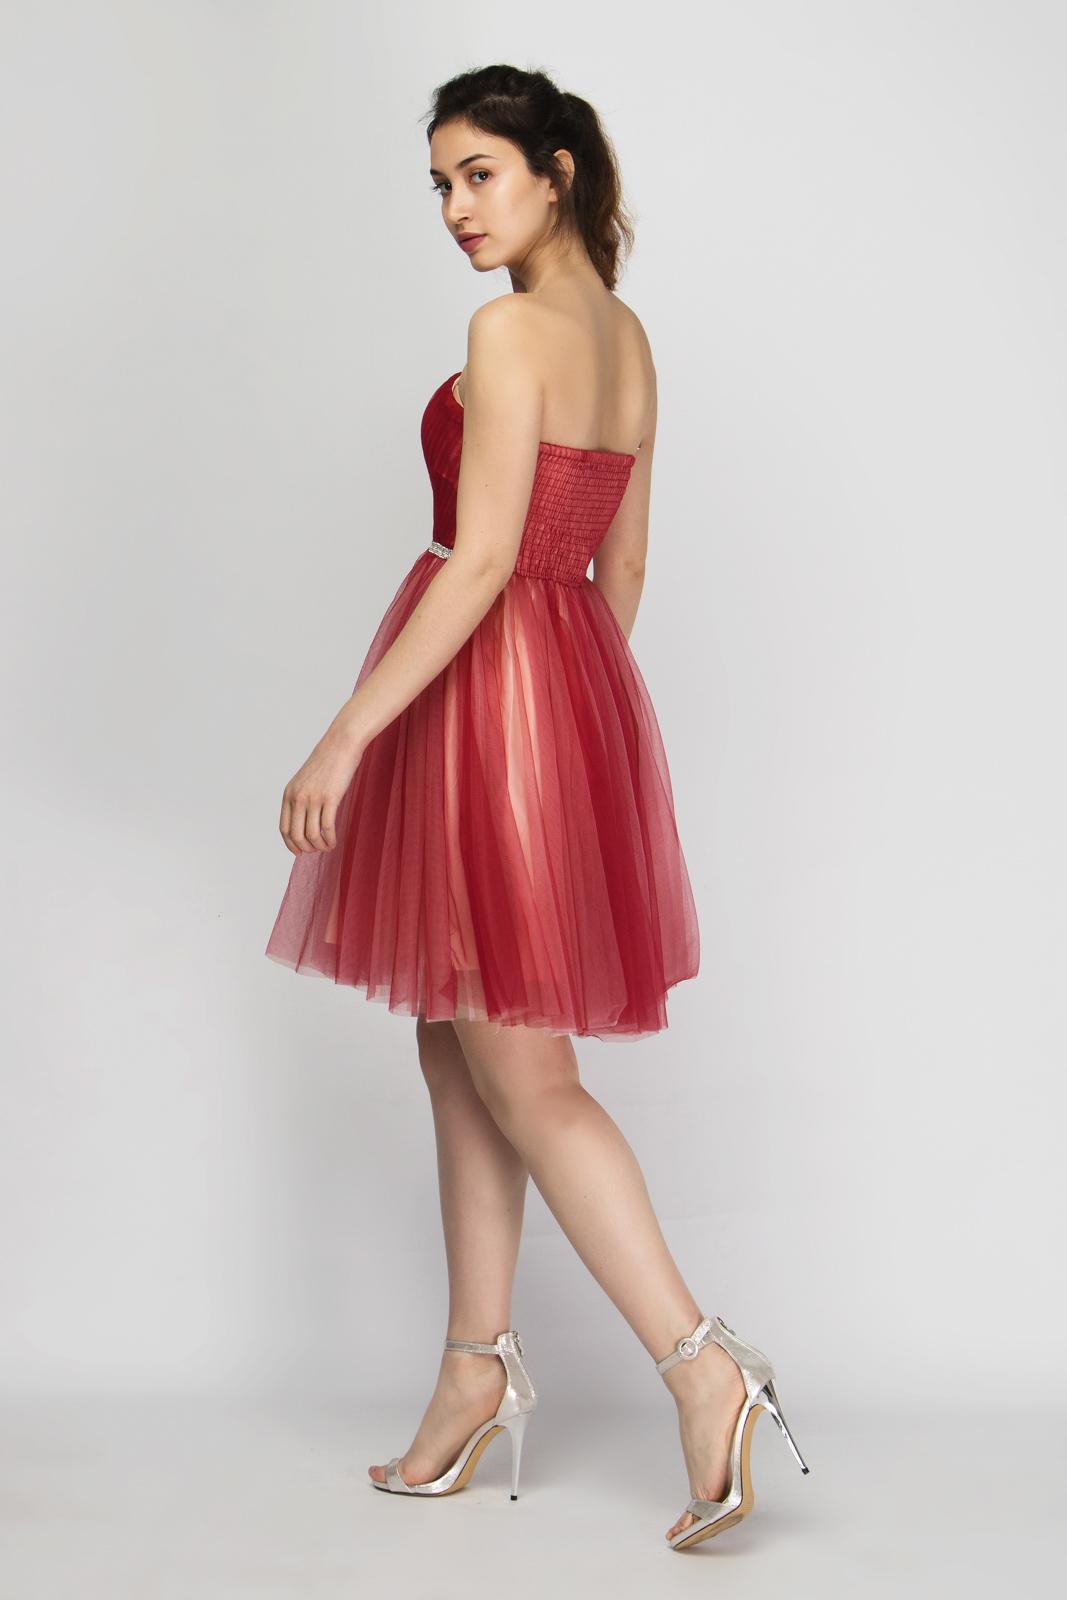 9f8334938bb4 Φόρεμα Στράπλες με Εσάρπα Διακοσμημένο με Στρας